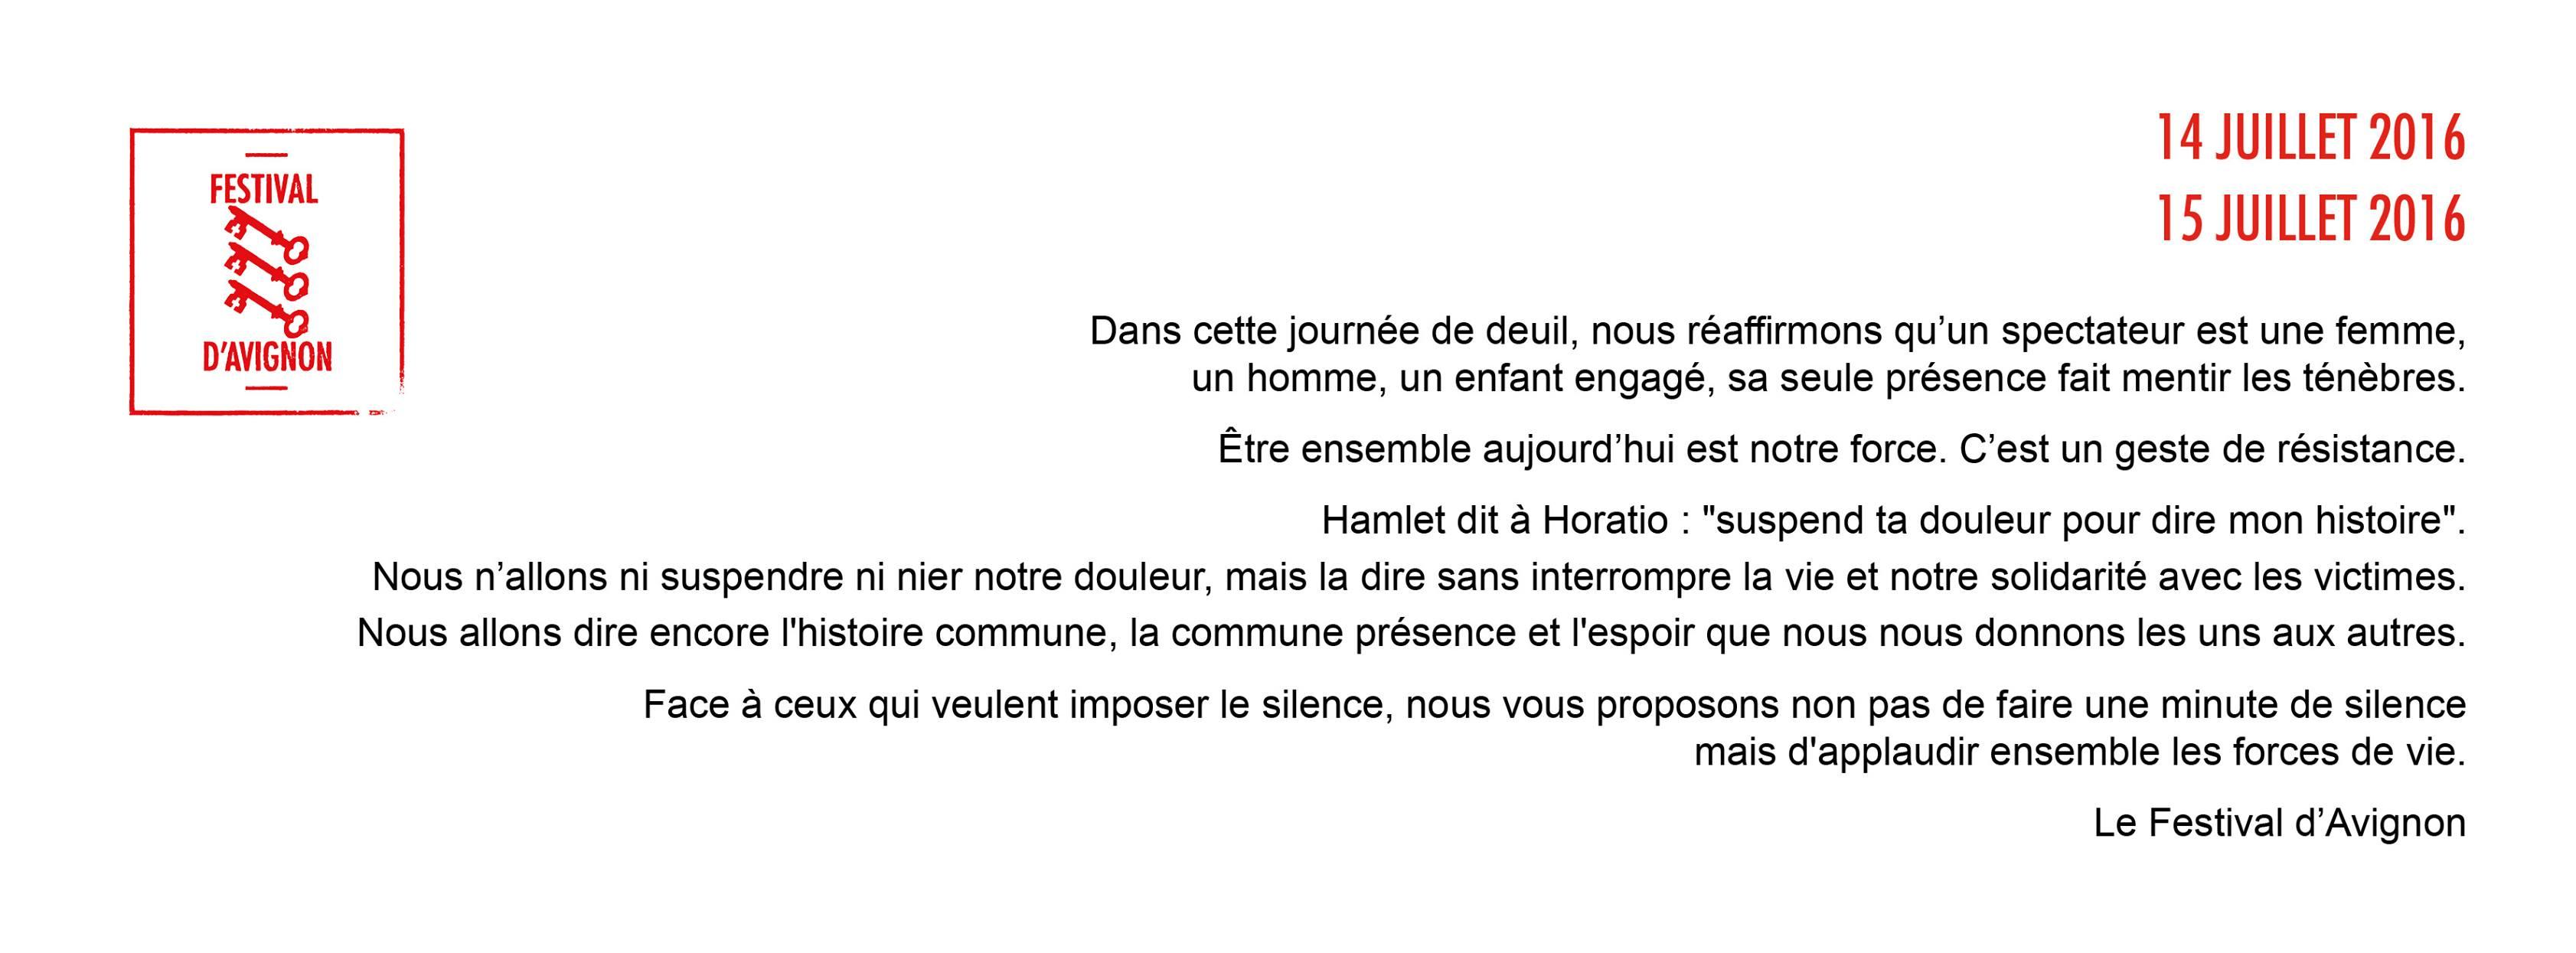 comuniqué festival avignon suite attentat de Nice